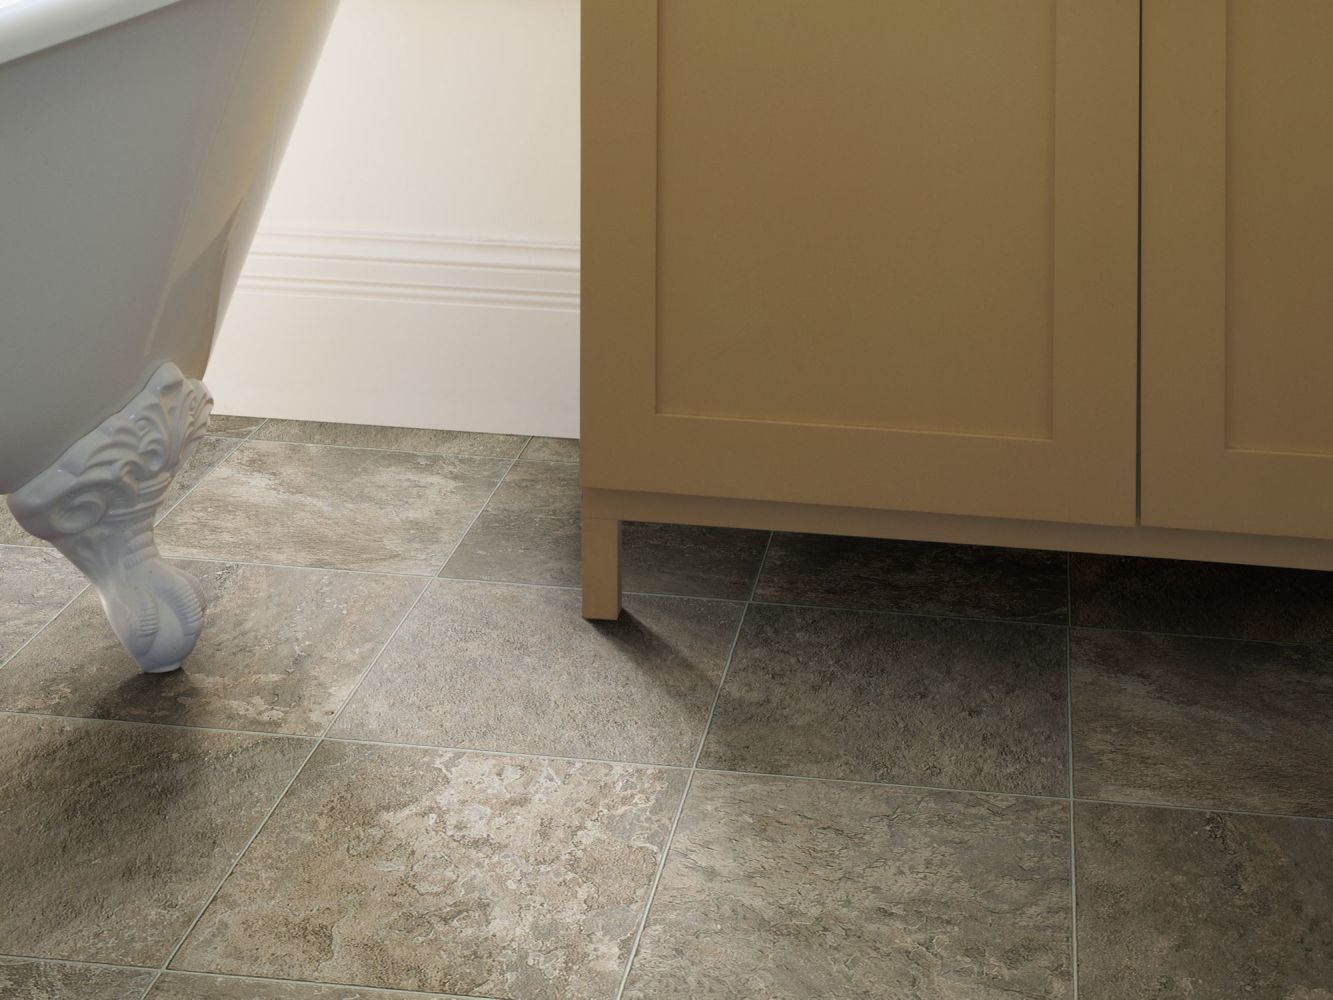 Shaw Floors Resilient Property Solutions Home Front Tile Pueblo 00139_VG069